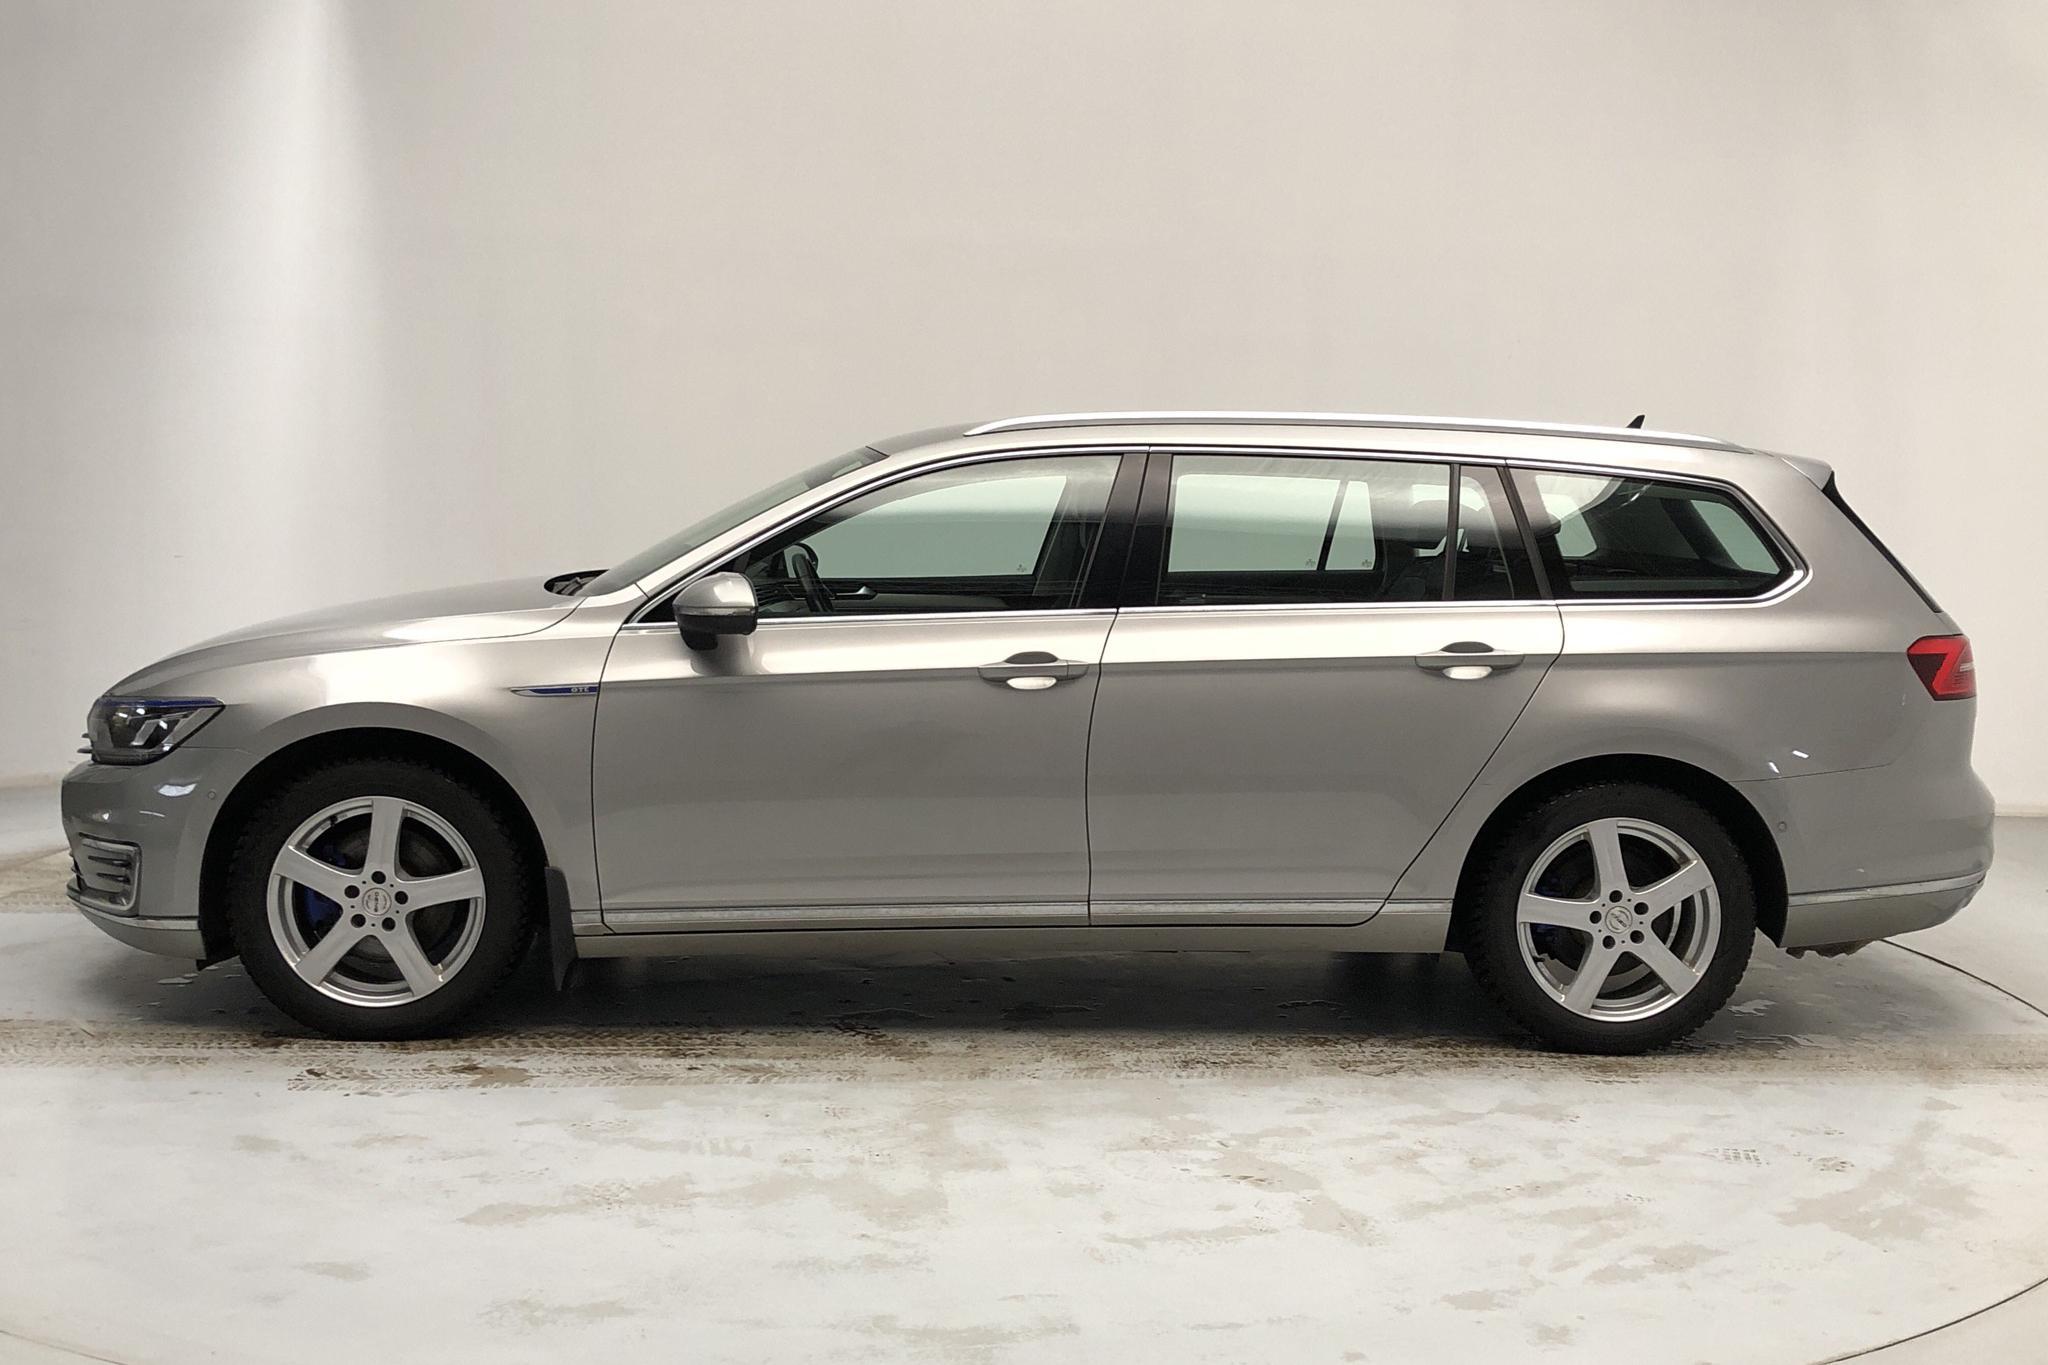 VW Passat 1.4 Plug-in-Hybrid Sportscombi (218hk) - 105 070 km - Automatic - silver - 2016